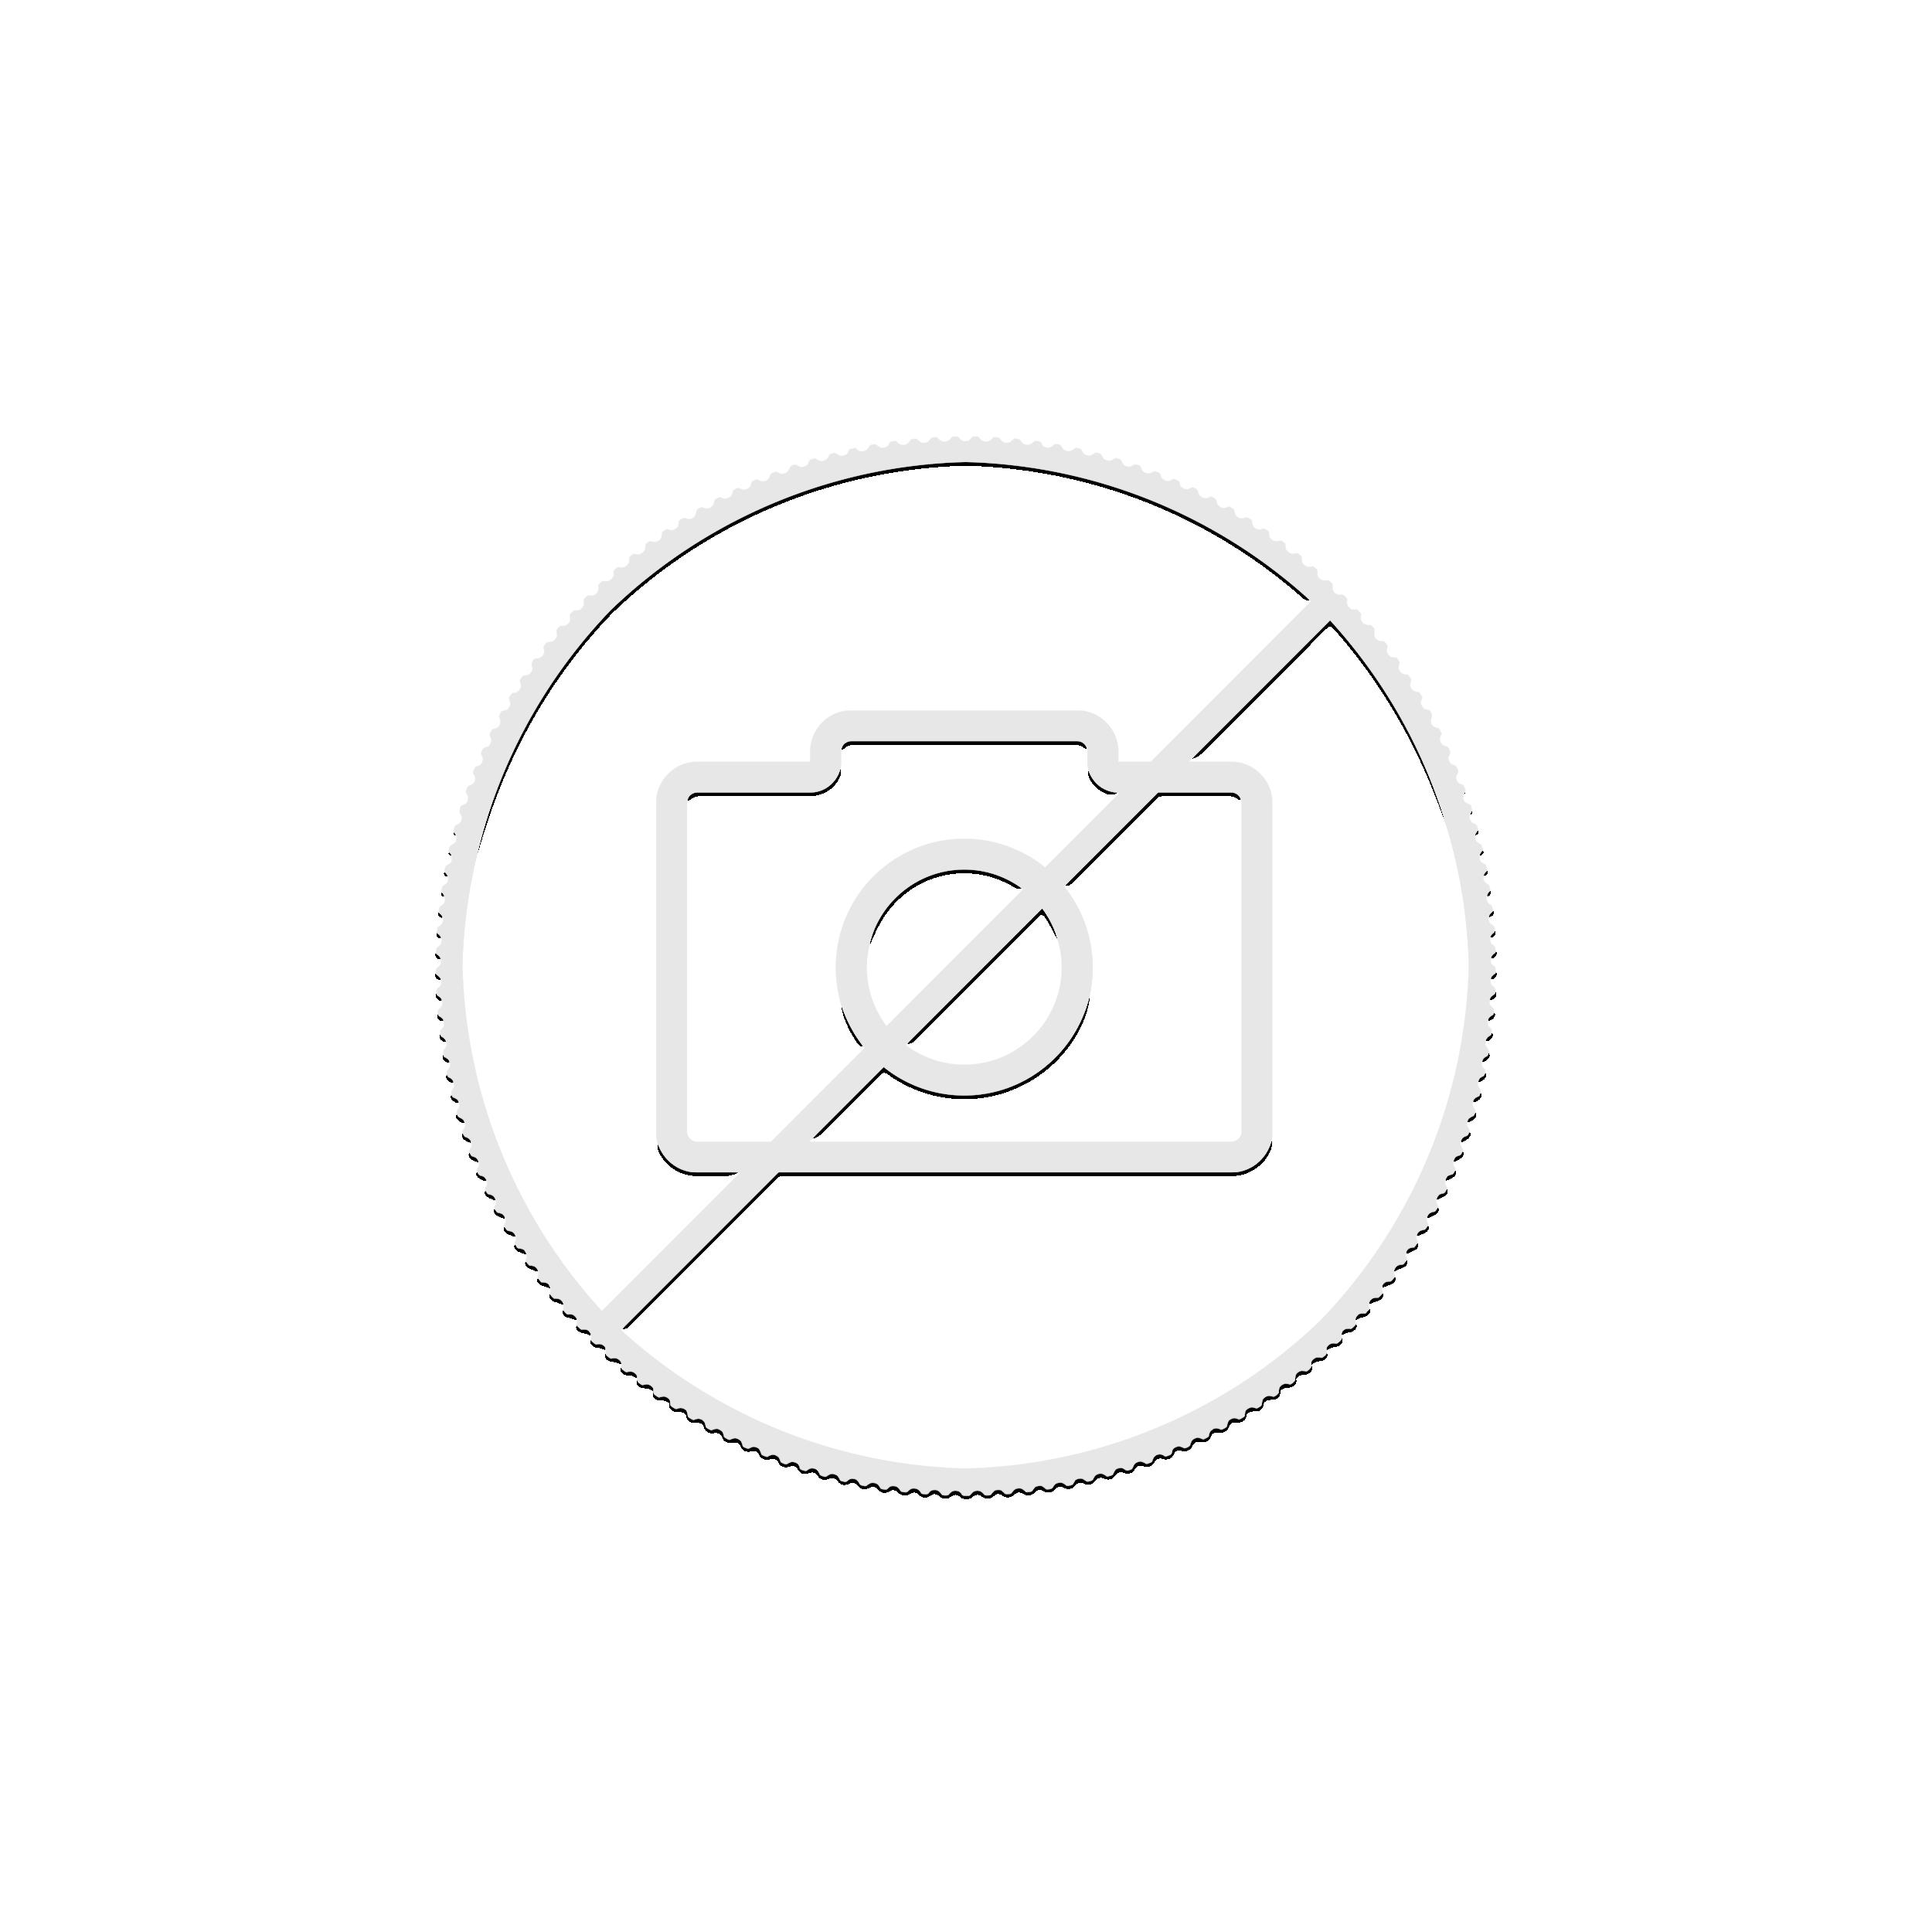 2 troy ounce zilveren munt Velociraptor 2021